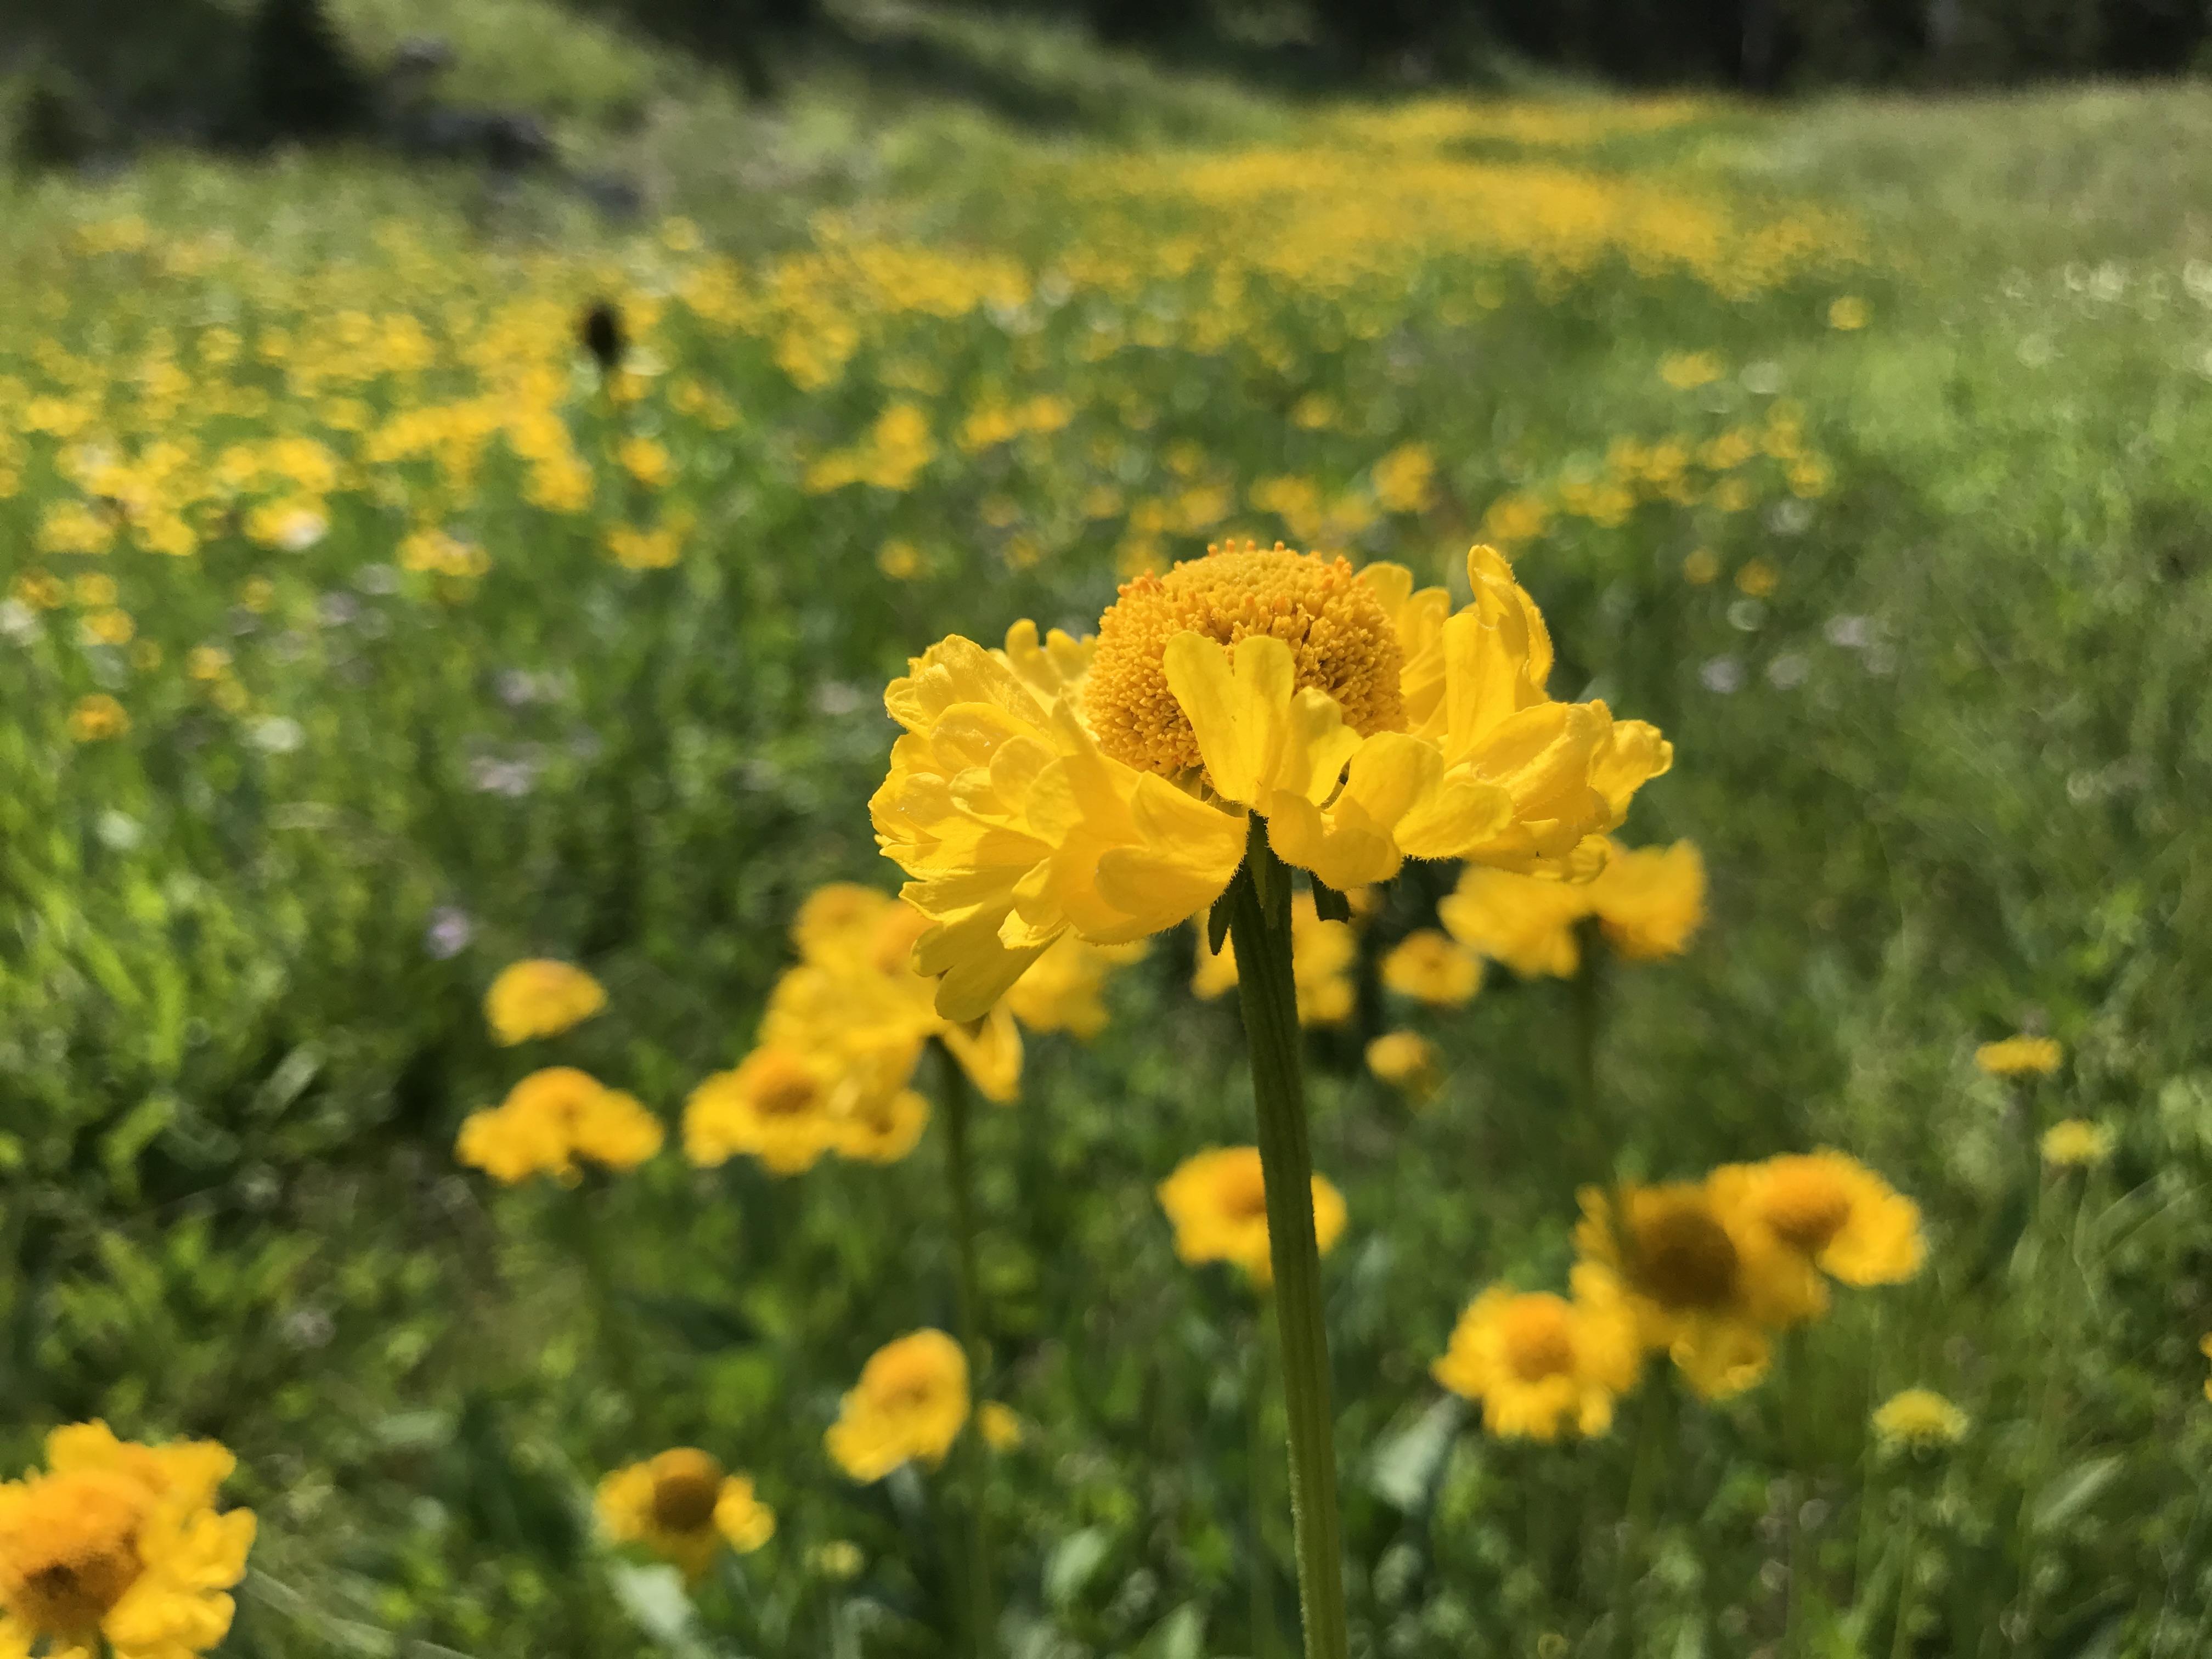 Blog - Page 3 of 10 - Klamath Siskiyou Native Seeds